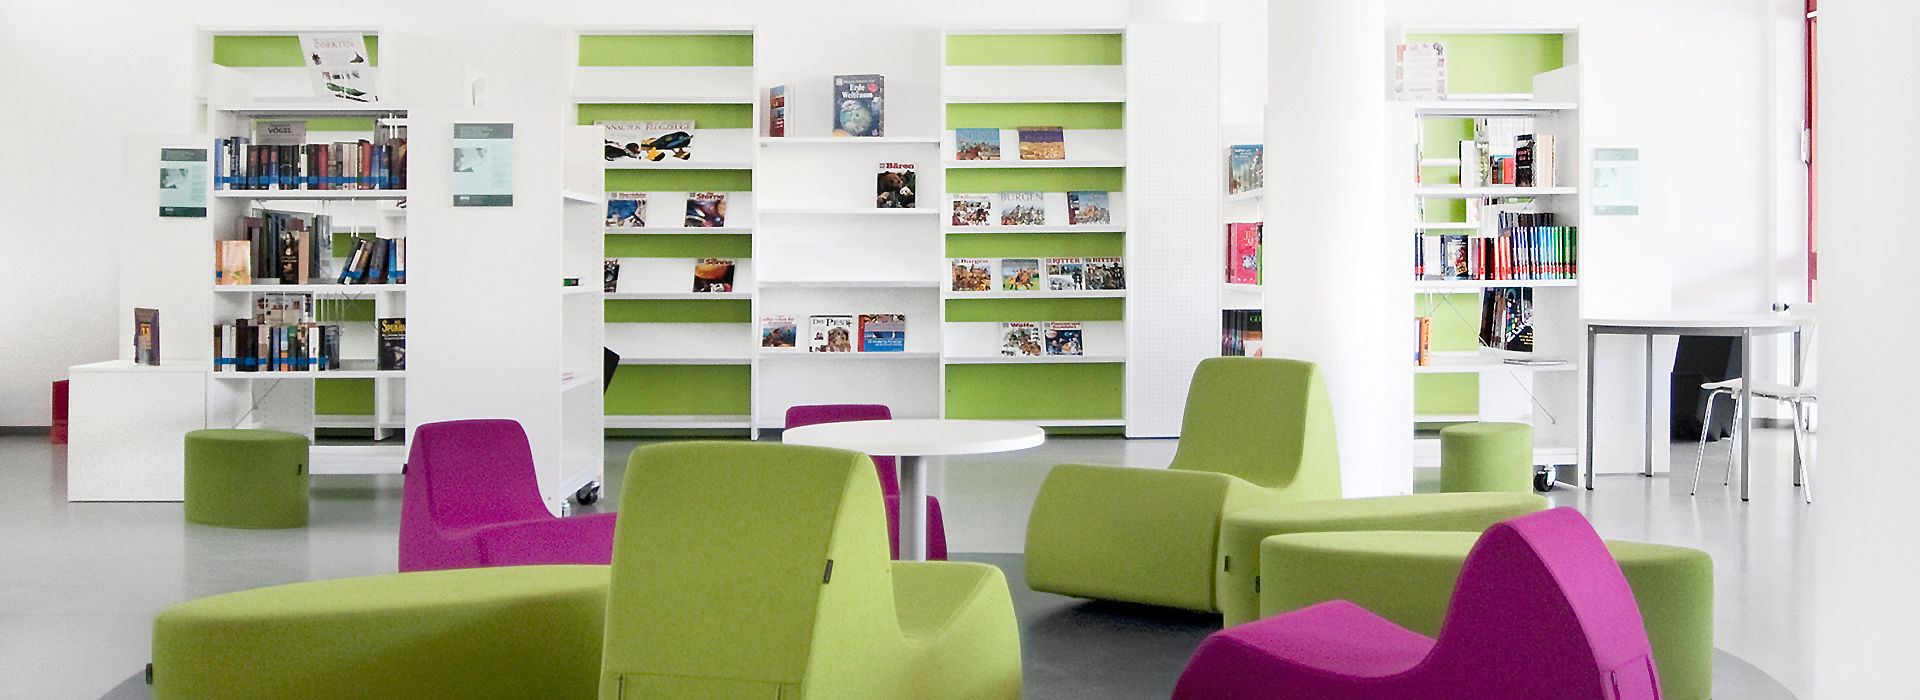 Bild: Bibliothek aus RATIO Grundregalen